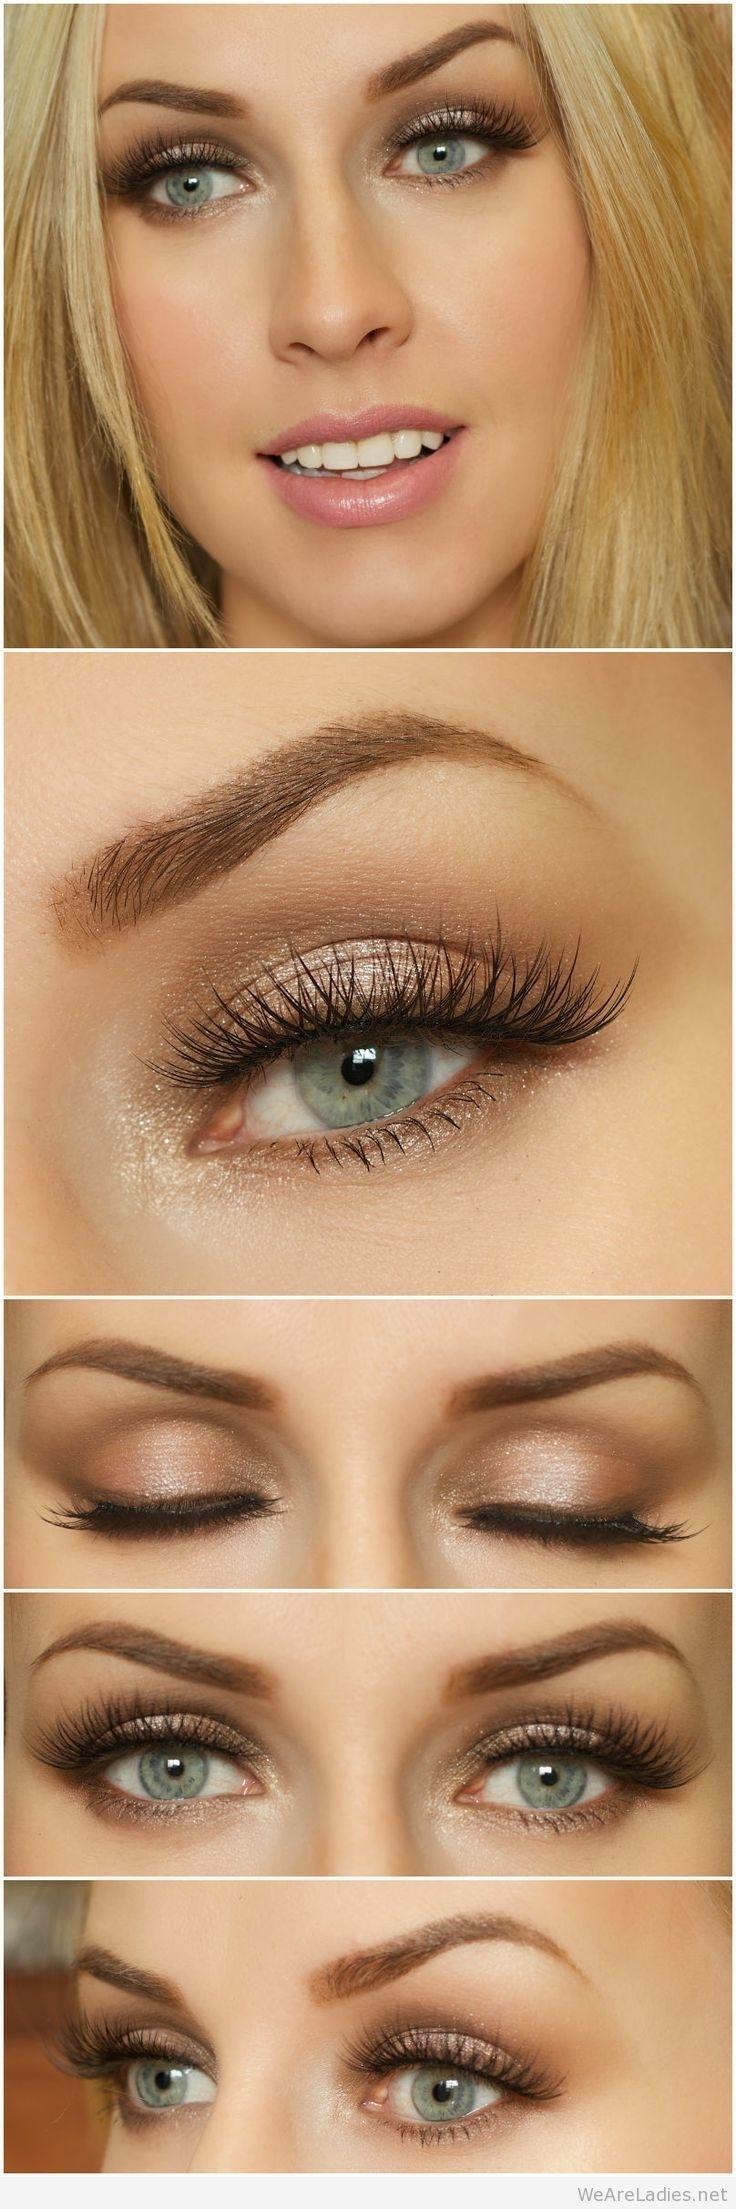 Brown Eye Makeup For Blue Eyes And Blonde Hair | Makeup In 2019 for How To Apply Eye Makeup For Blue Eyes Blonde Hair